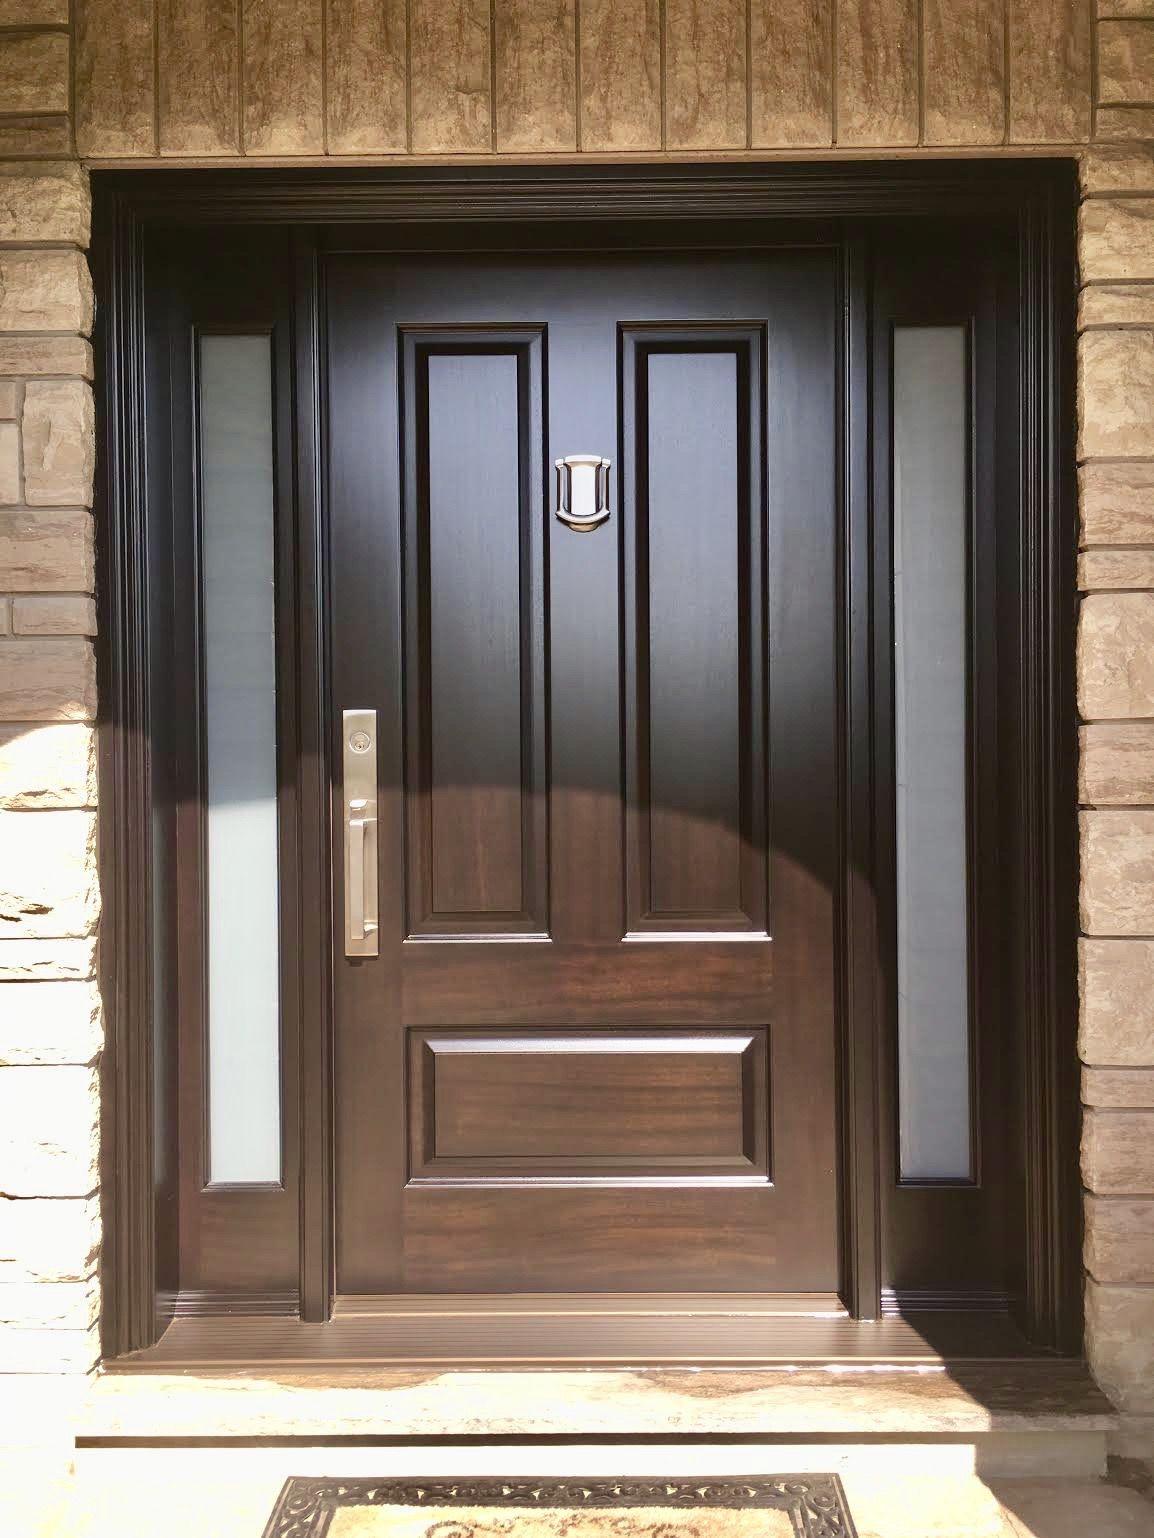 Amberwood Doors Inc: Stunning #handmade #custommade #solid #mahogany